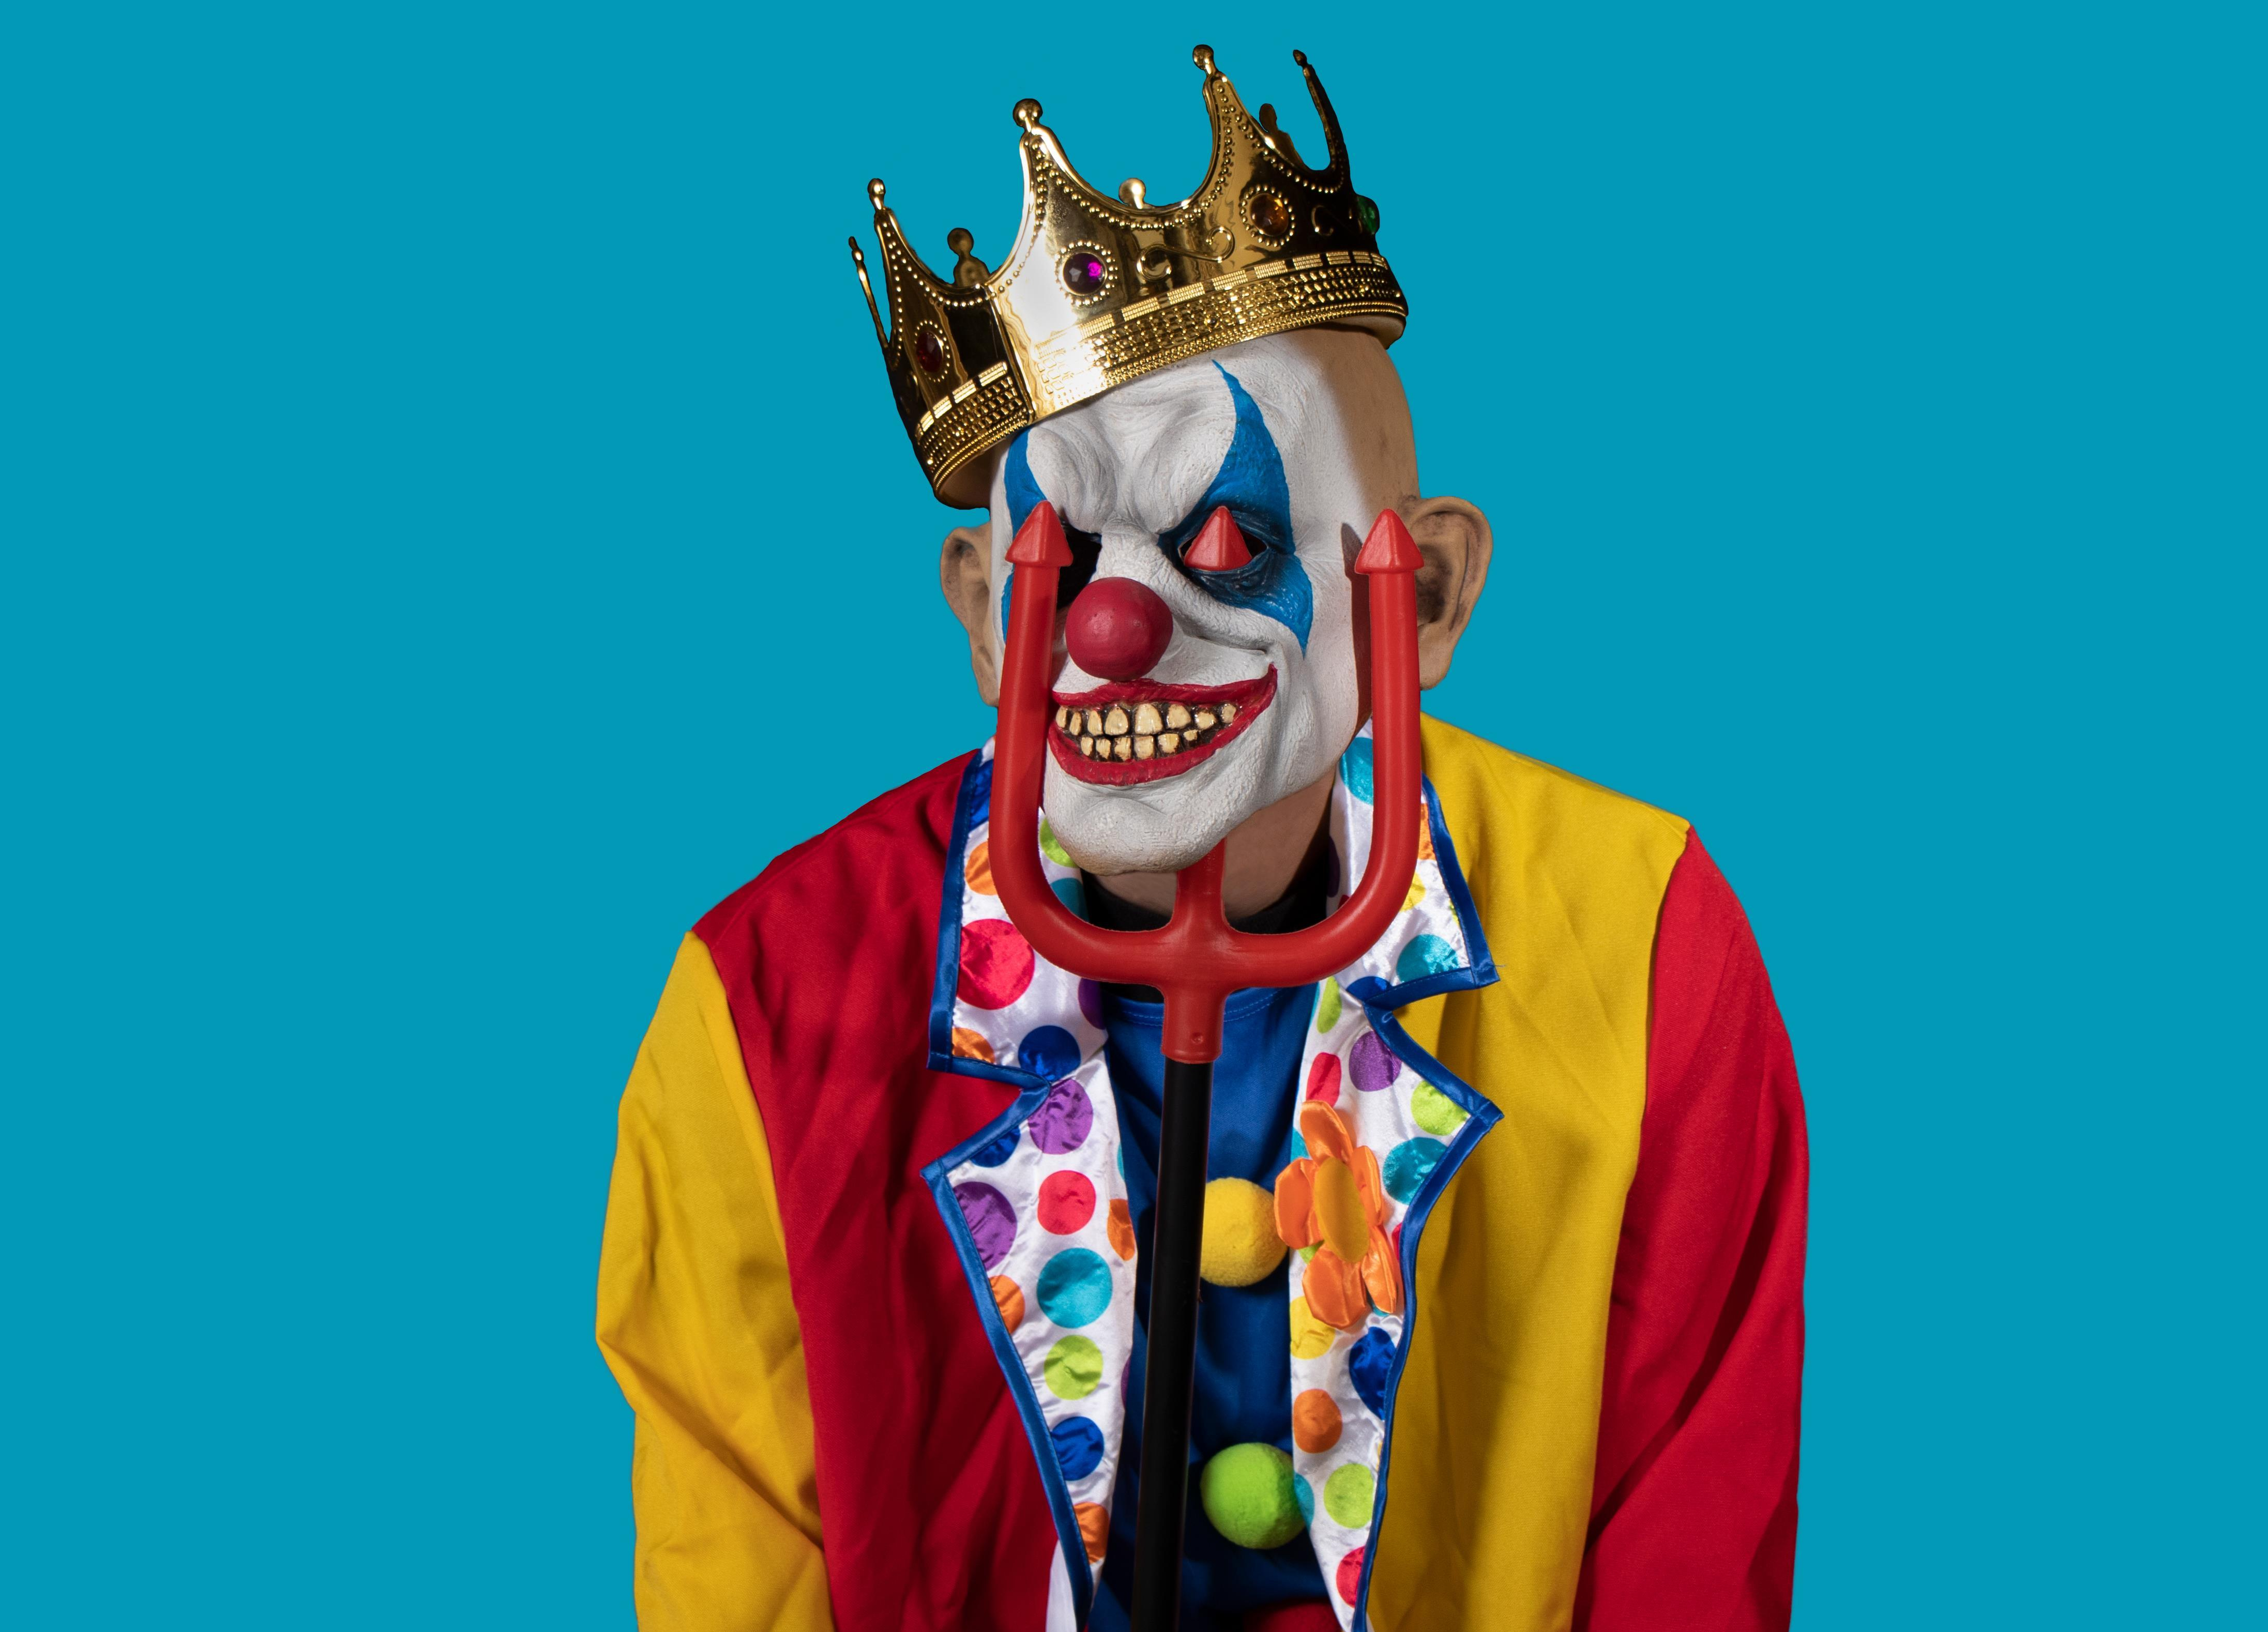 496ab_Sane_Austin_Crackles_the_Clown72